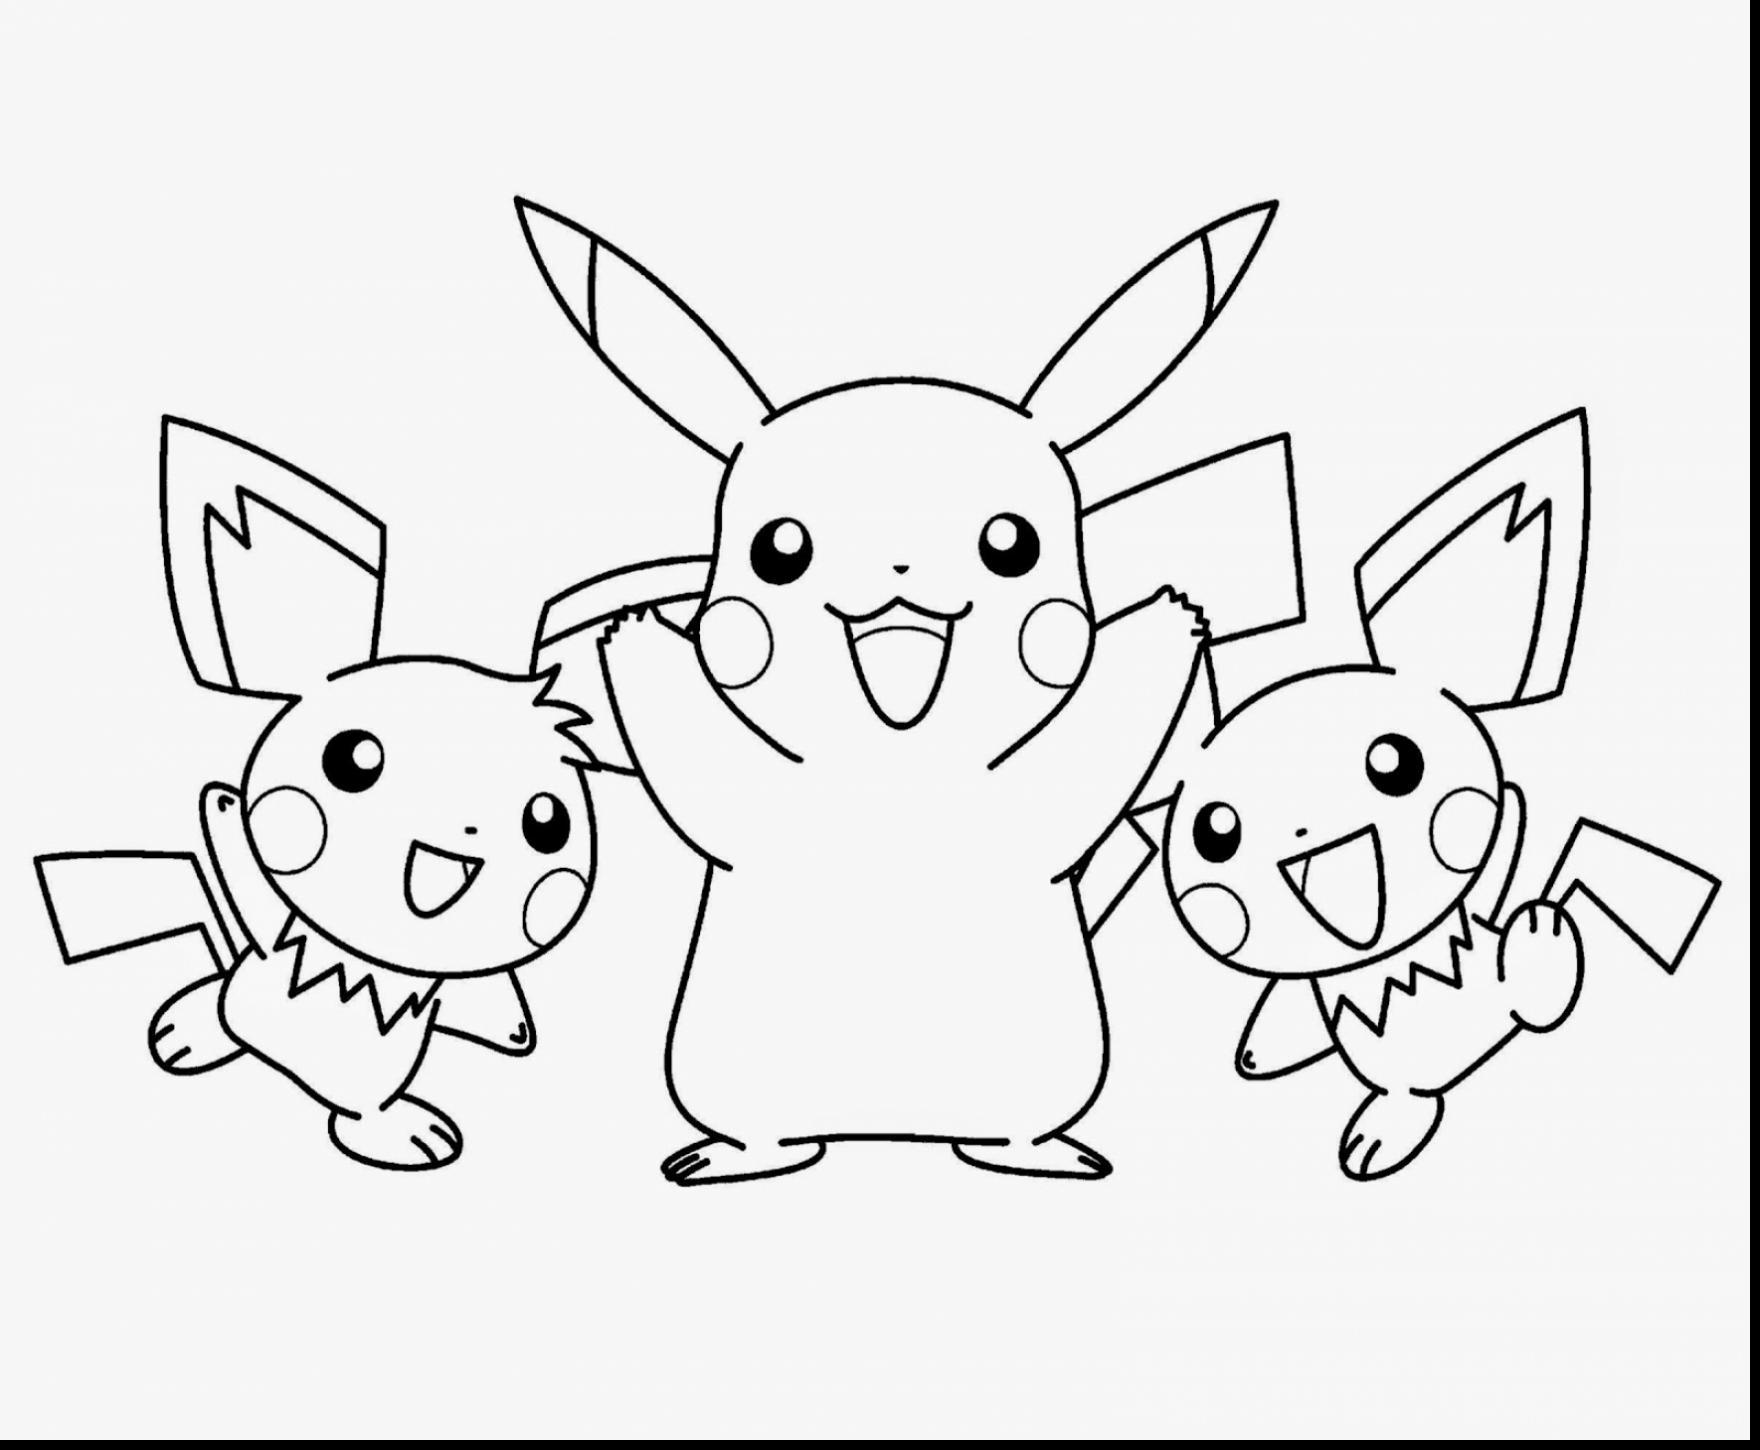 1760x1450 Surprising Design Ideas Pokemon Printable Coloring Pages Arceus